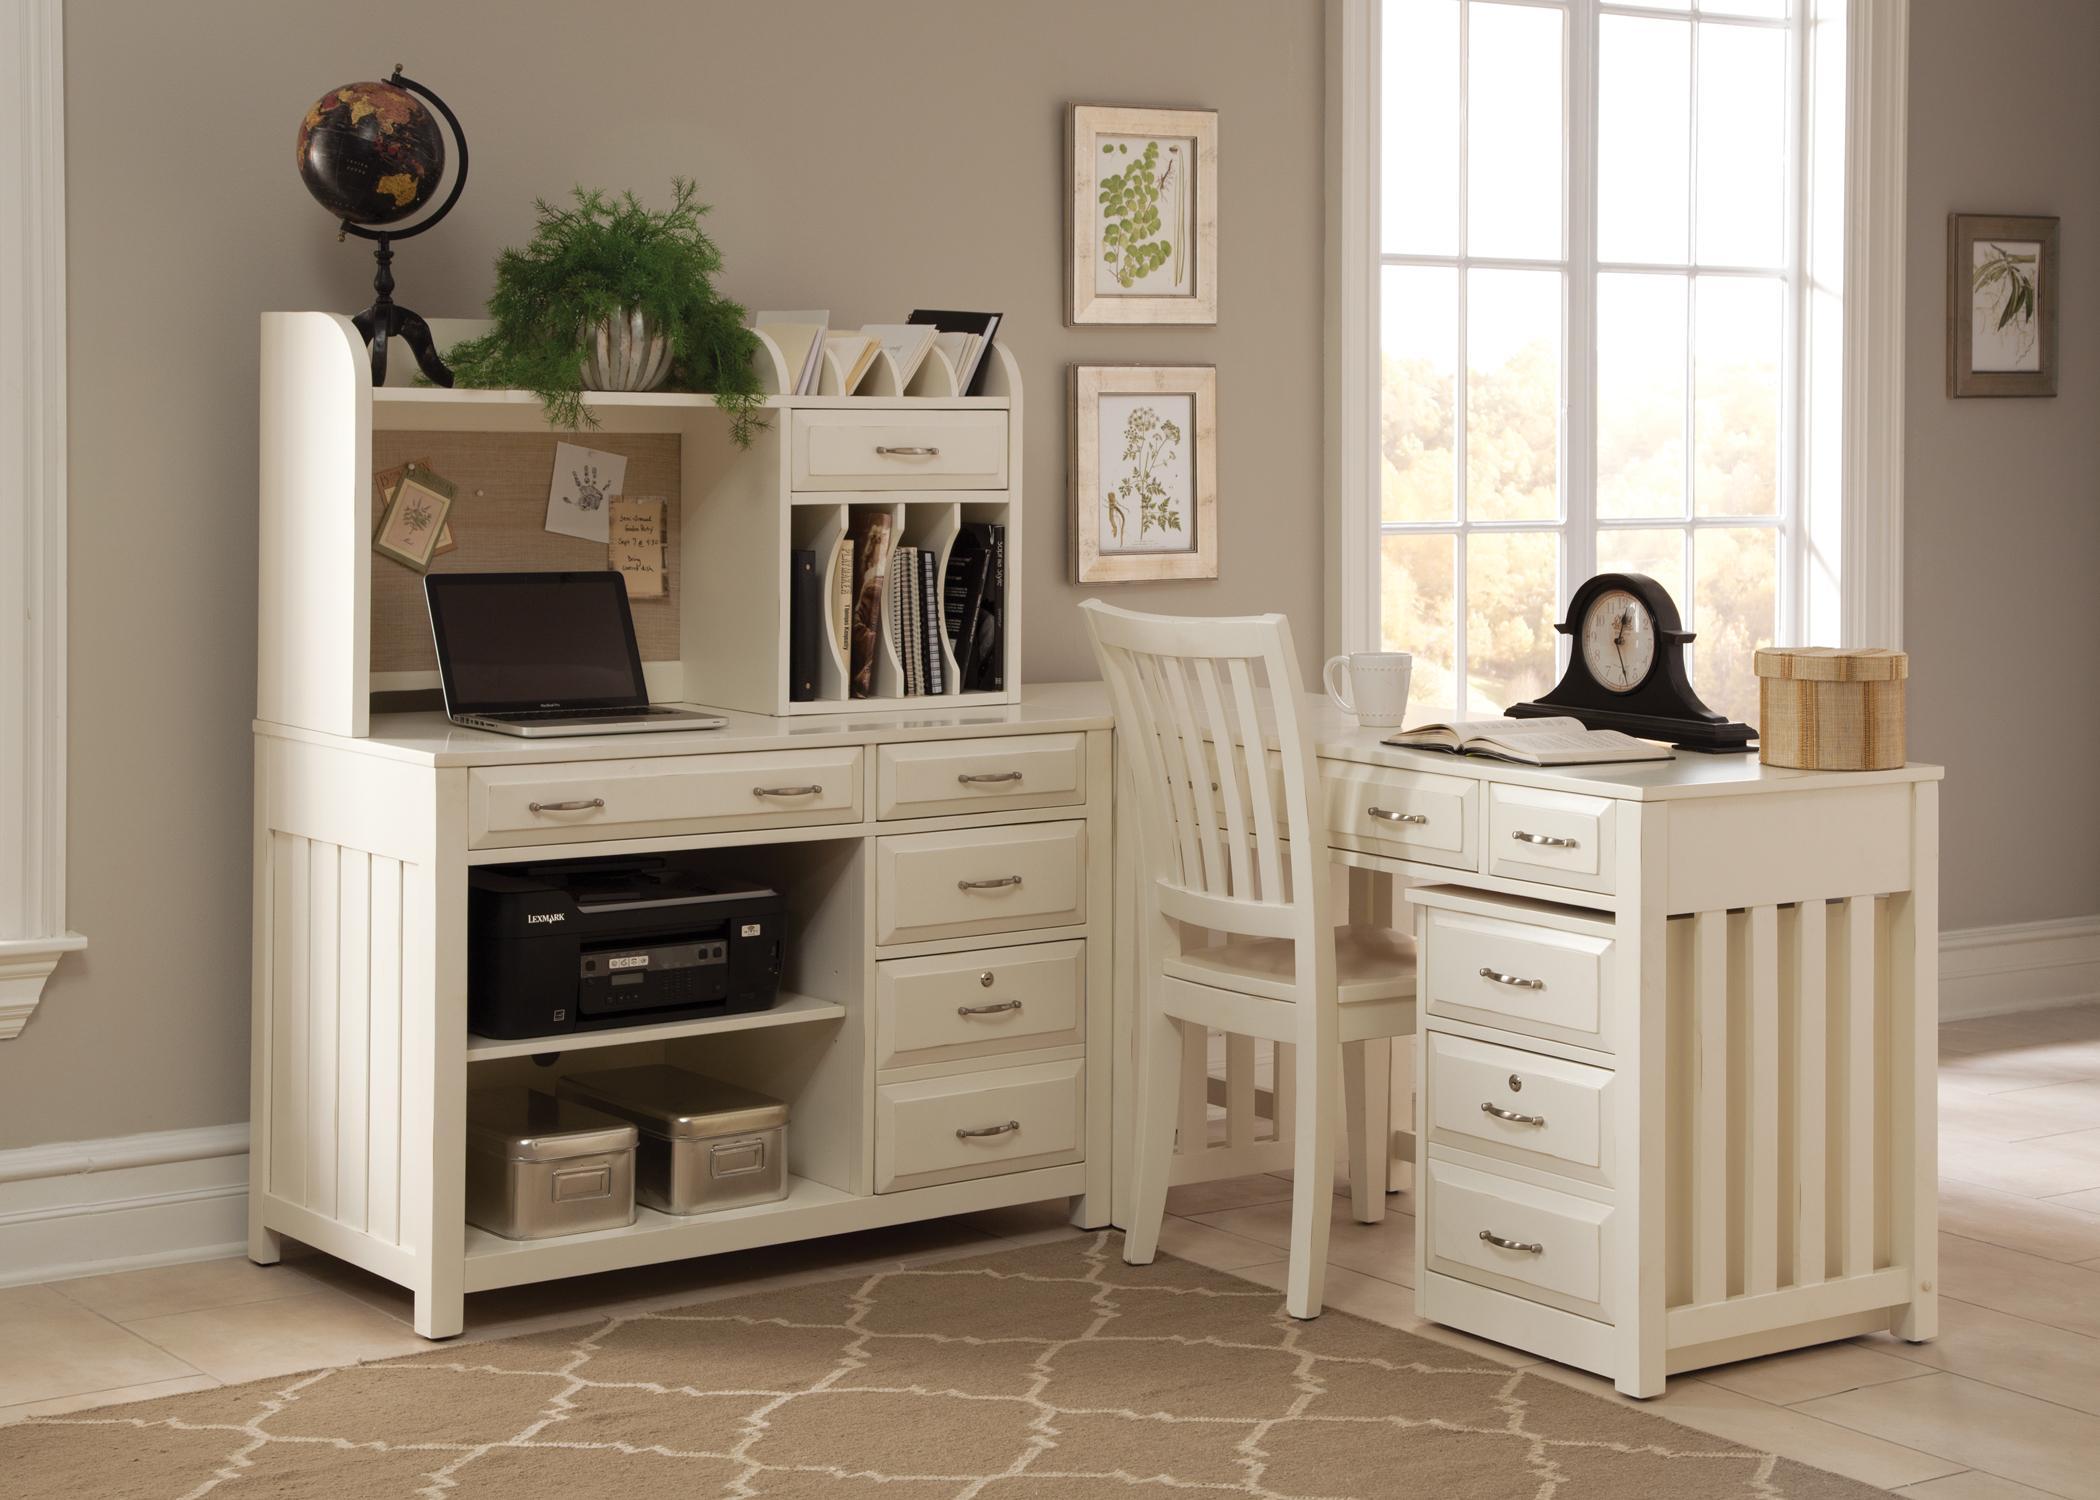 Superbe Liberty Furniture Hampton Bay   White Home Office Desk With Hutch | Wayside  Furniture | Desk U0026 Hutch Sets